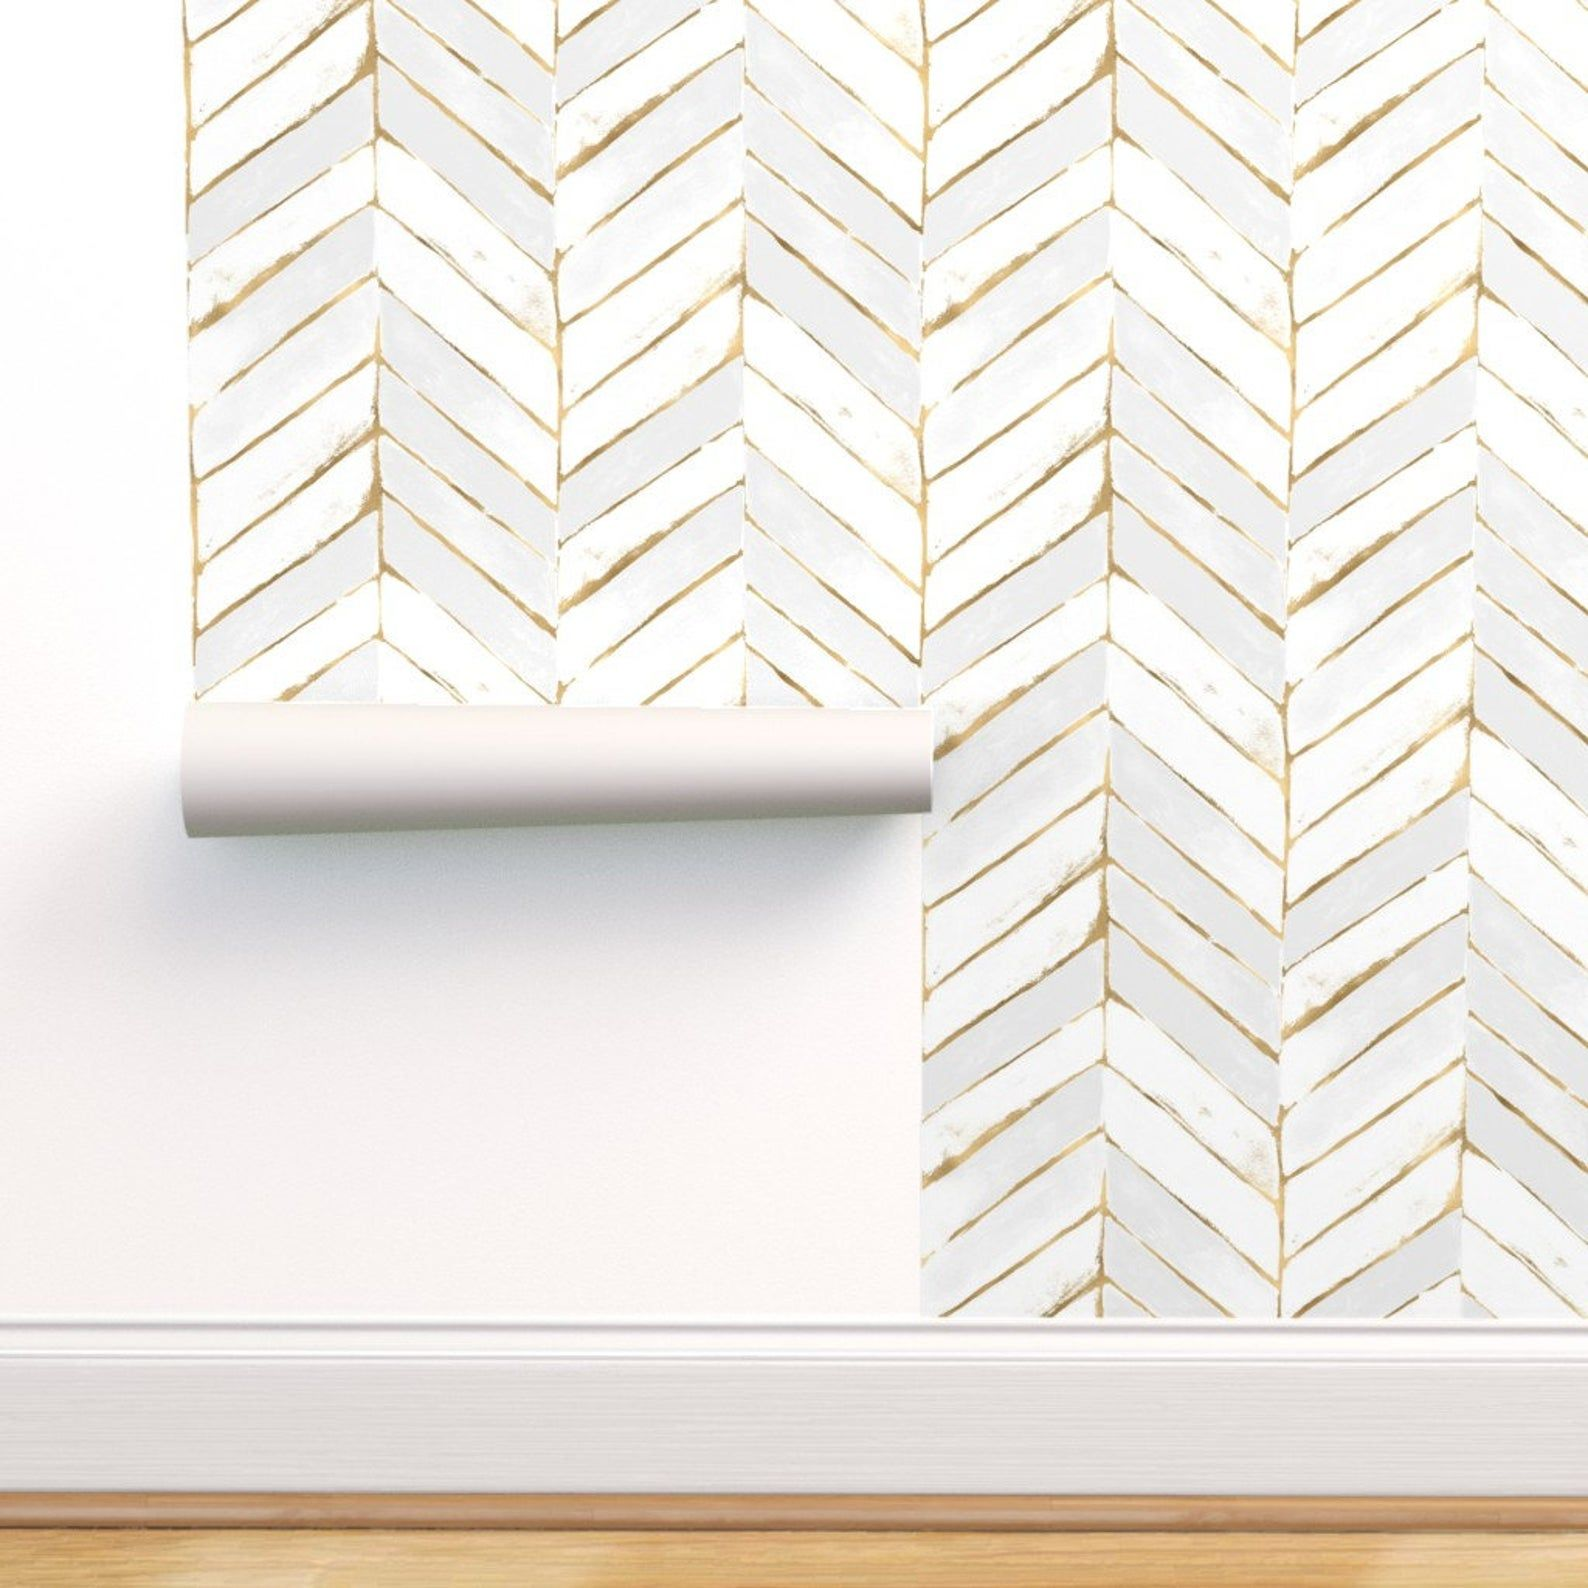 Chevron Wallpaper Chevron Painted White Gold L By Etsy Chevron Wallpaper Removable Wallpaper Self Adhesive Wallpaper